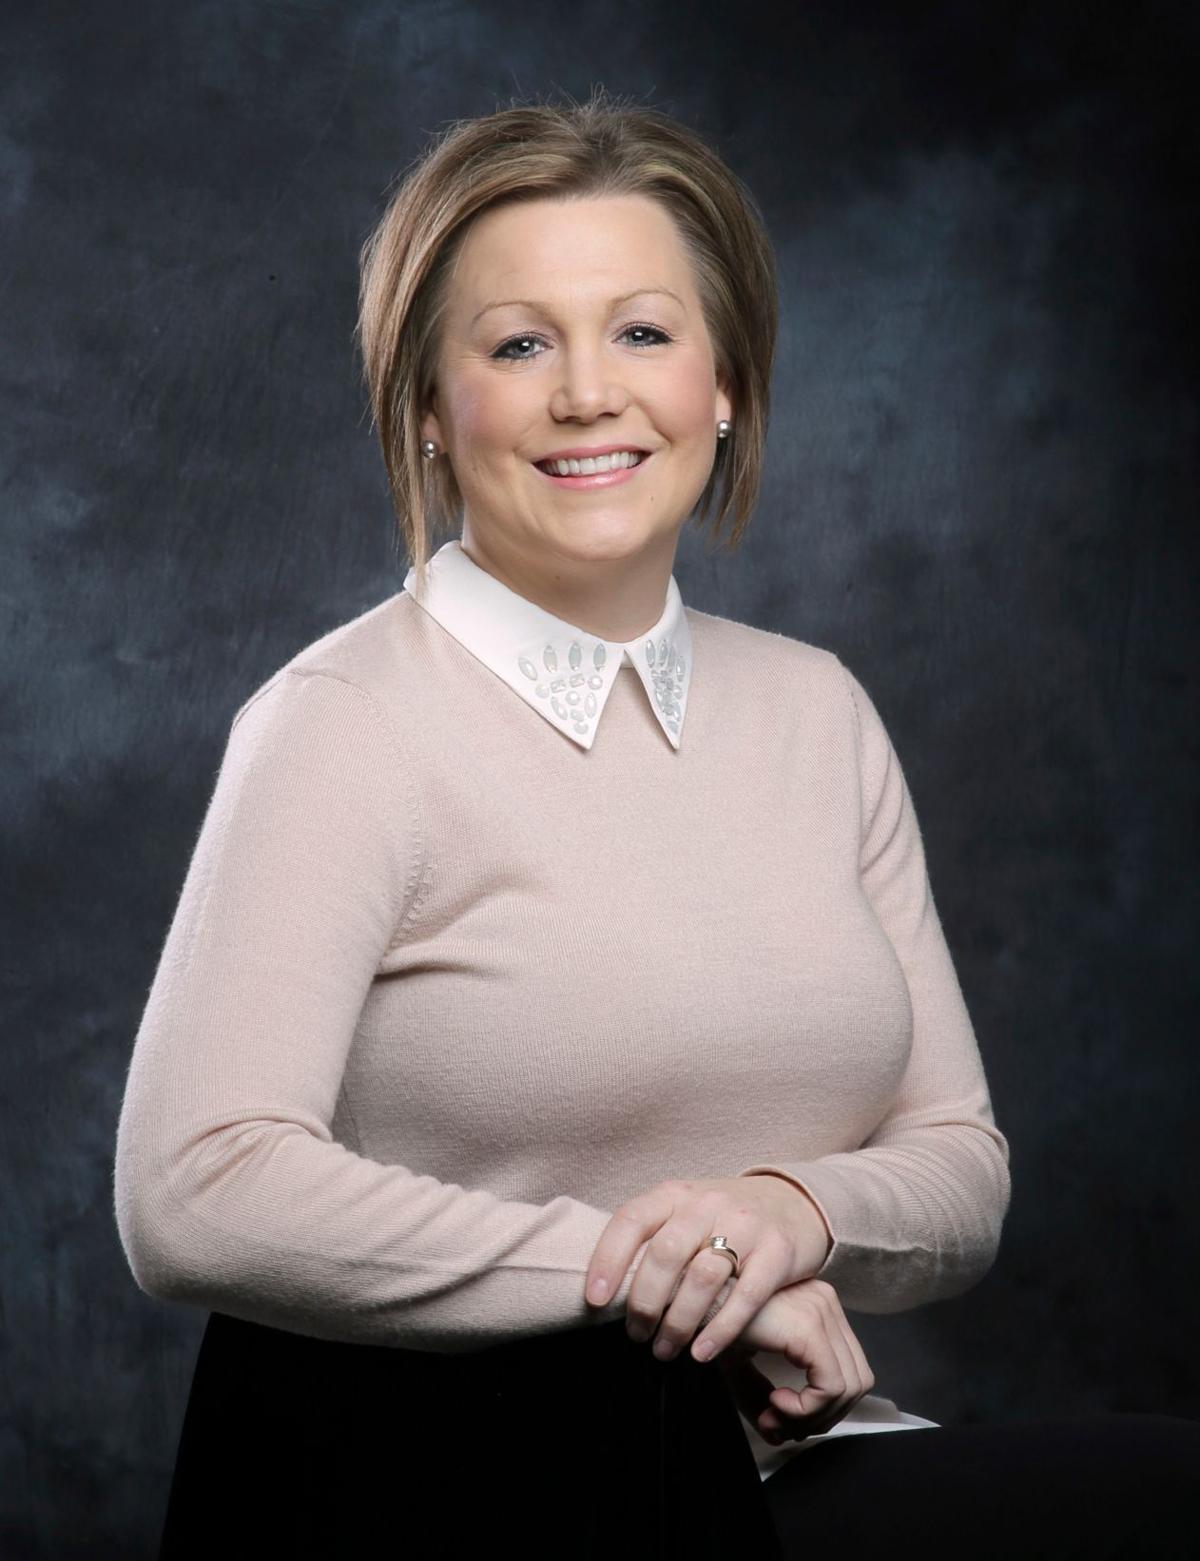 Tina Erhardt